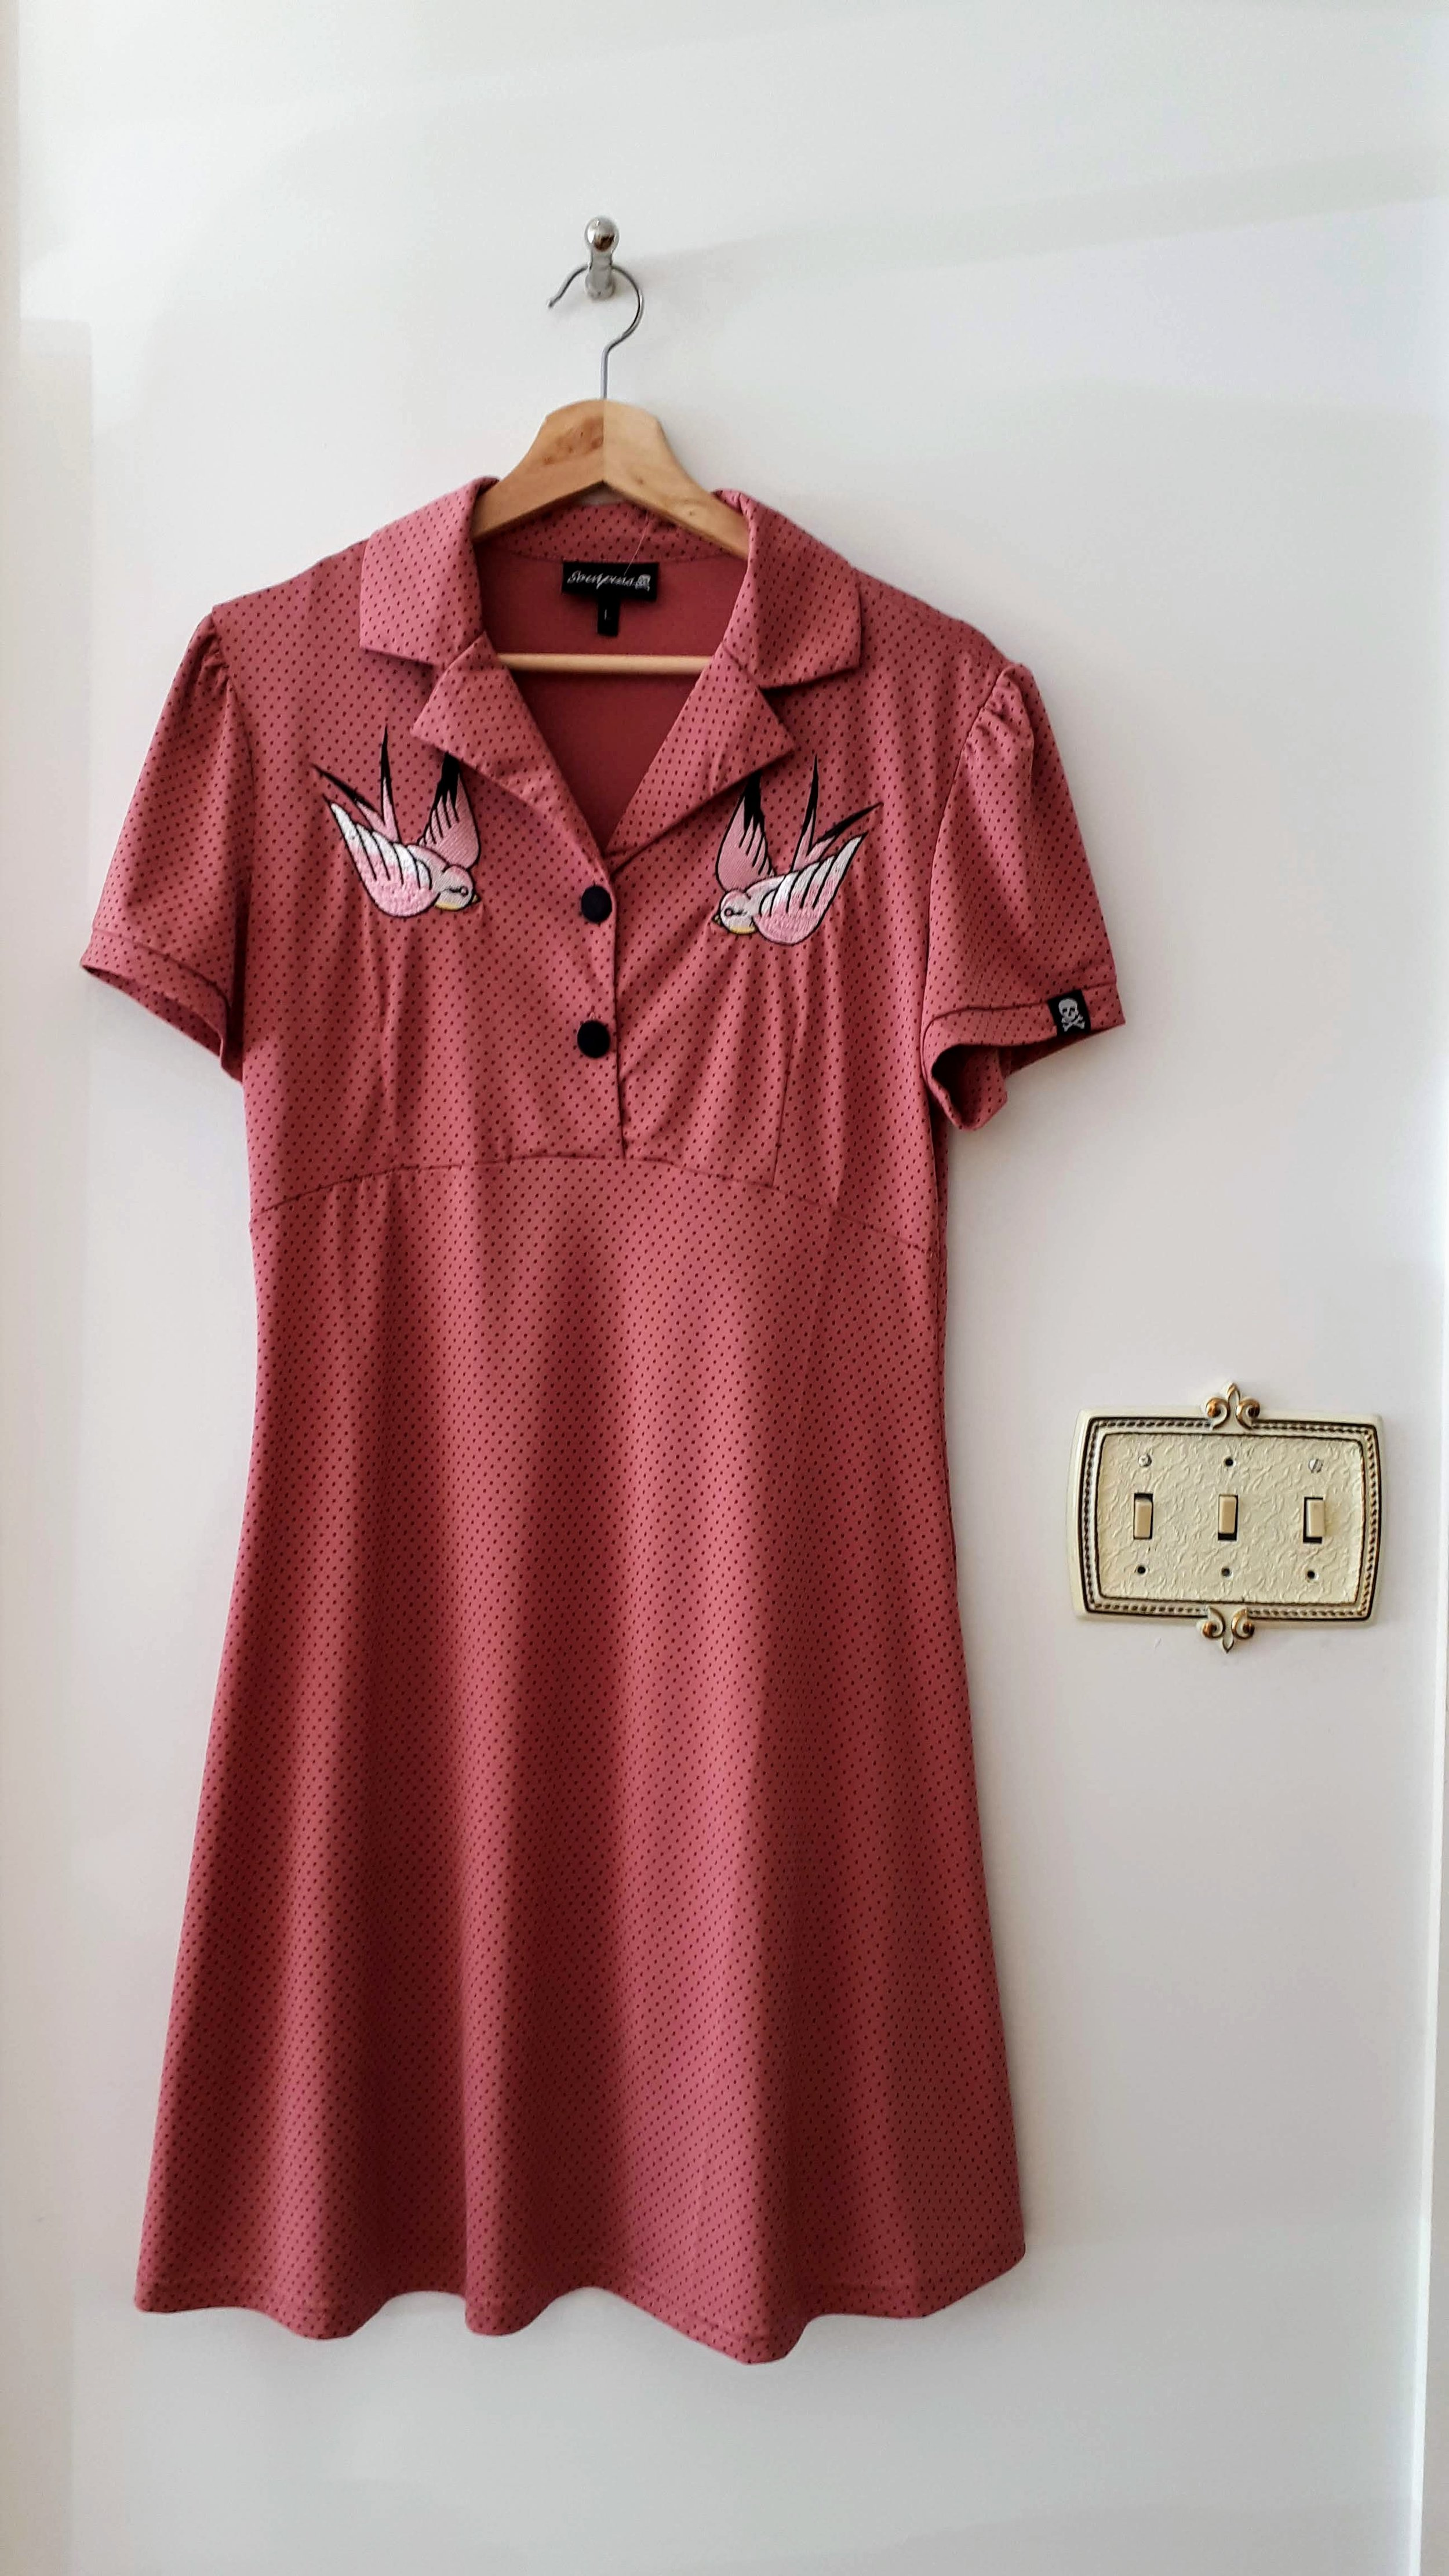 Sourpuss dress; Size L, $42